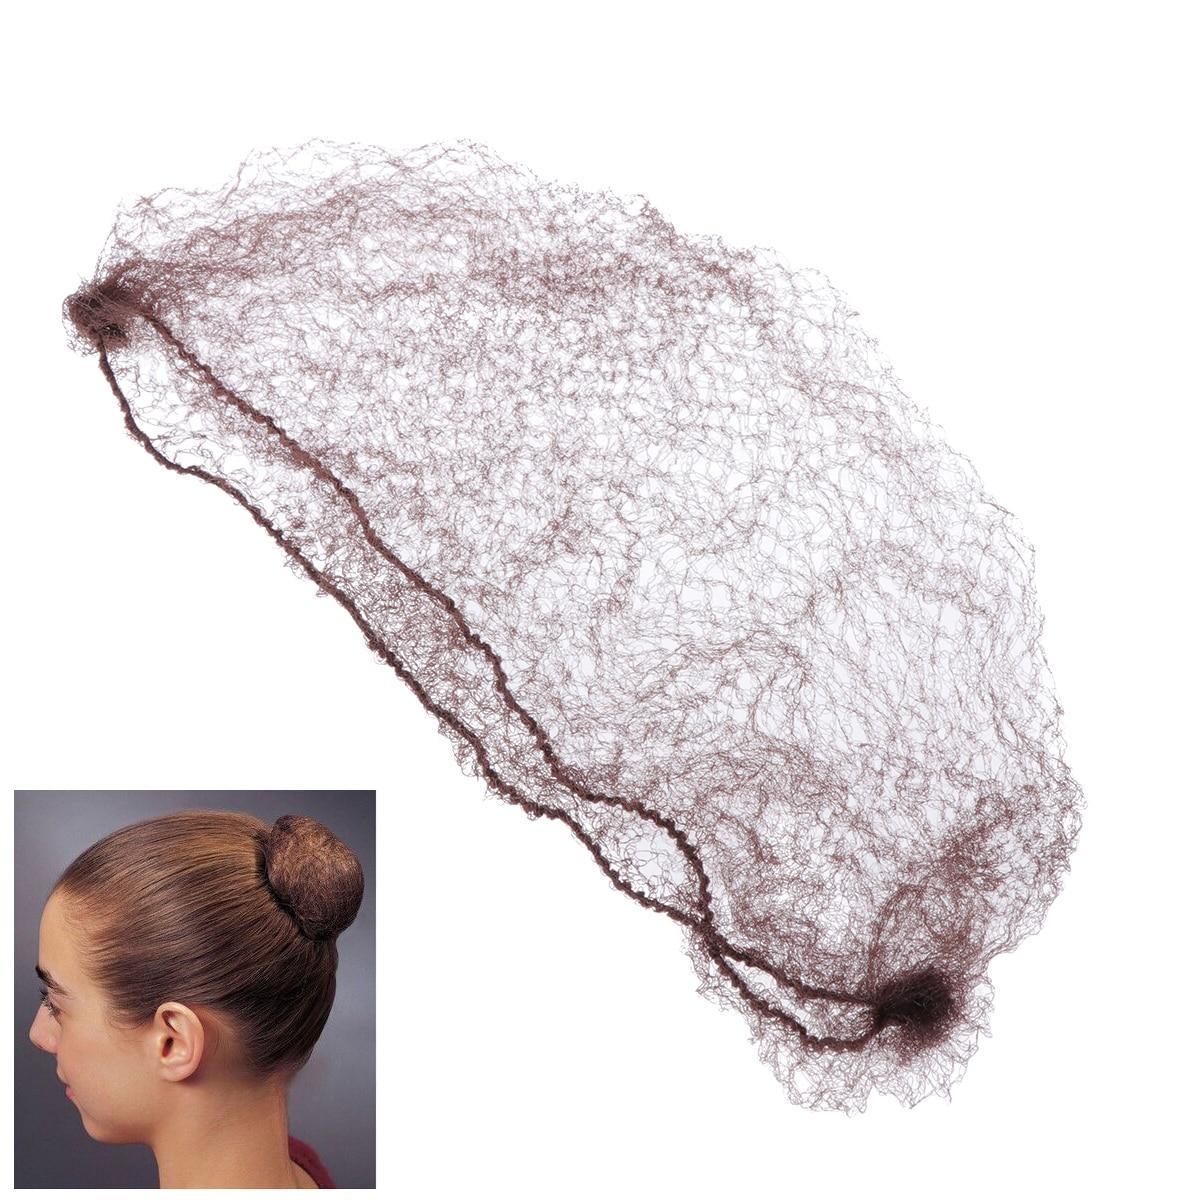 50pcs Hair Nets Invisible Elastic Edge Mesh Hairnet Ballet Bun Hair Nets Mesh Dance Skating Snoods Hair Net Bun Cover